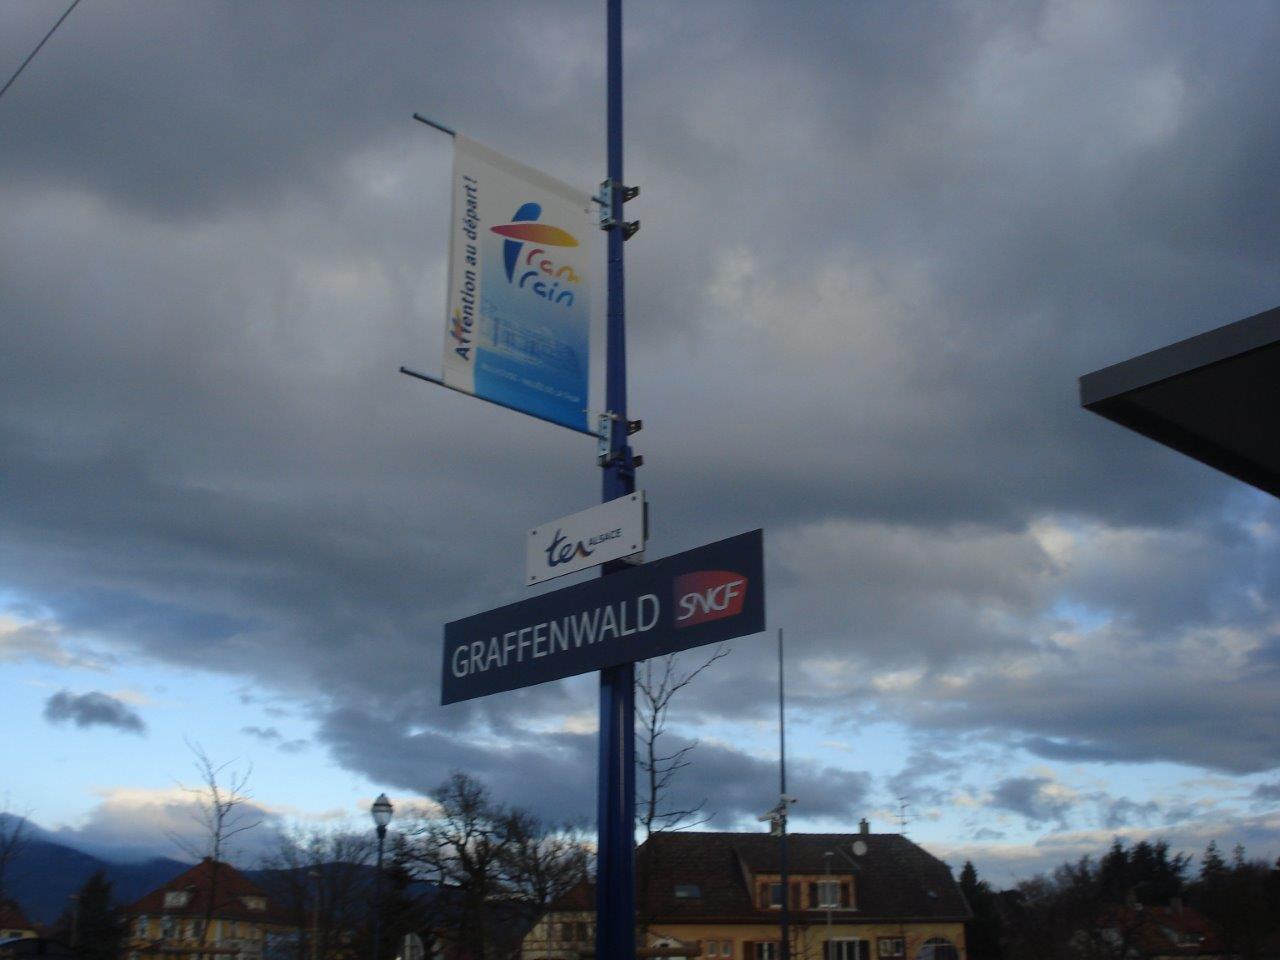 gare-de-graffenwald-train-station